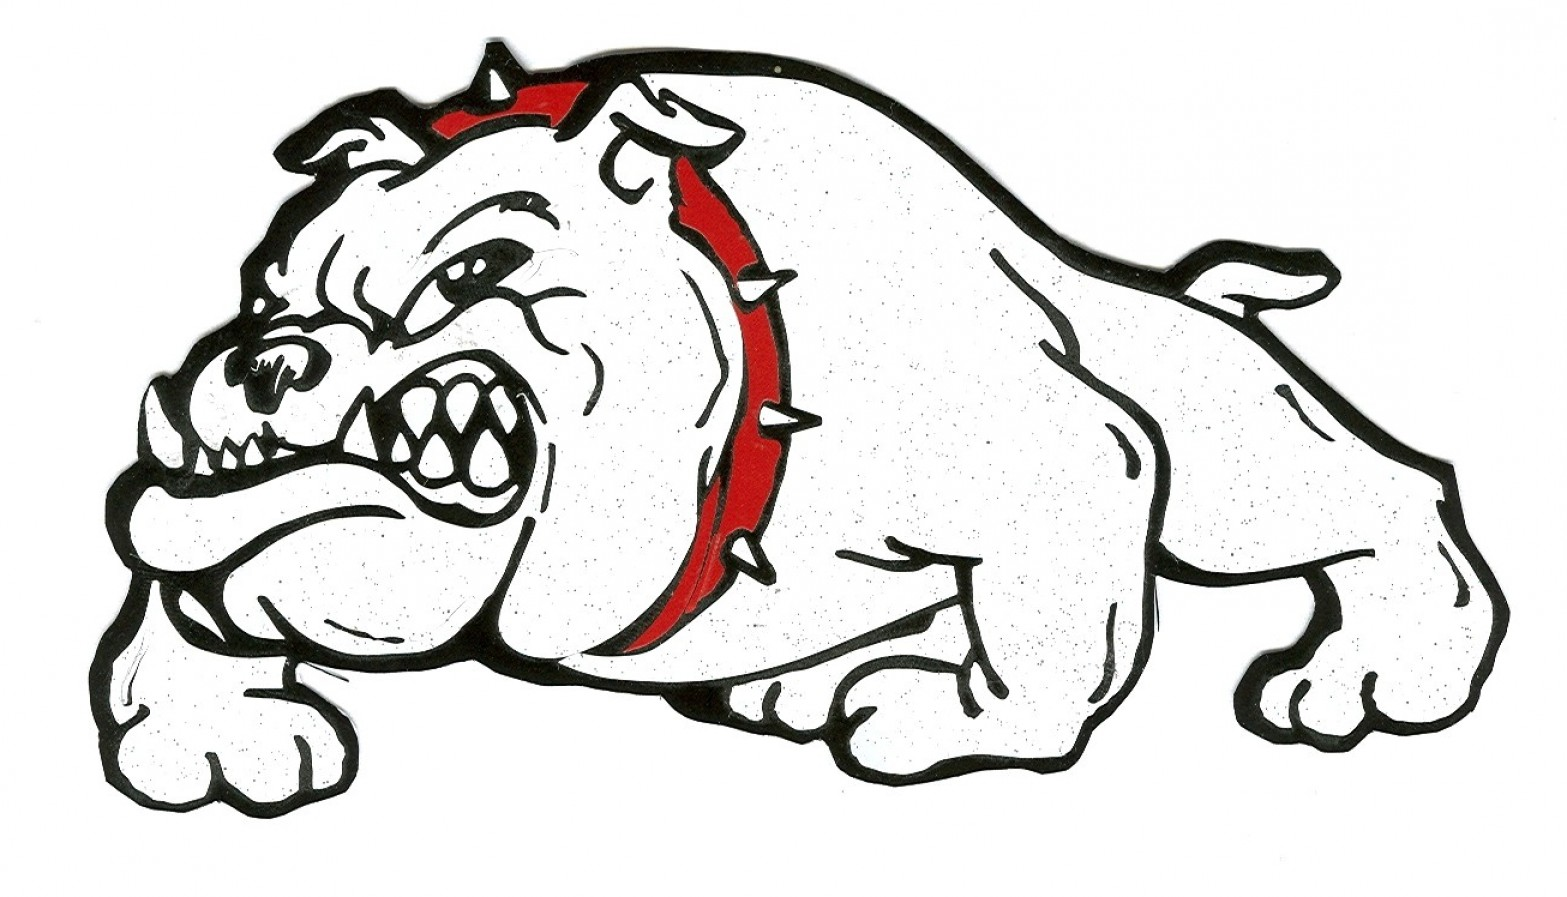 Bulldog mascot clipart jpg library library Bulldog Mascot Clipart New Ga Uga Cartoon English Of | HandandBeak jpg library library